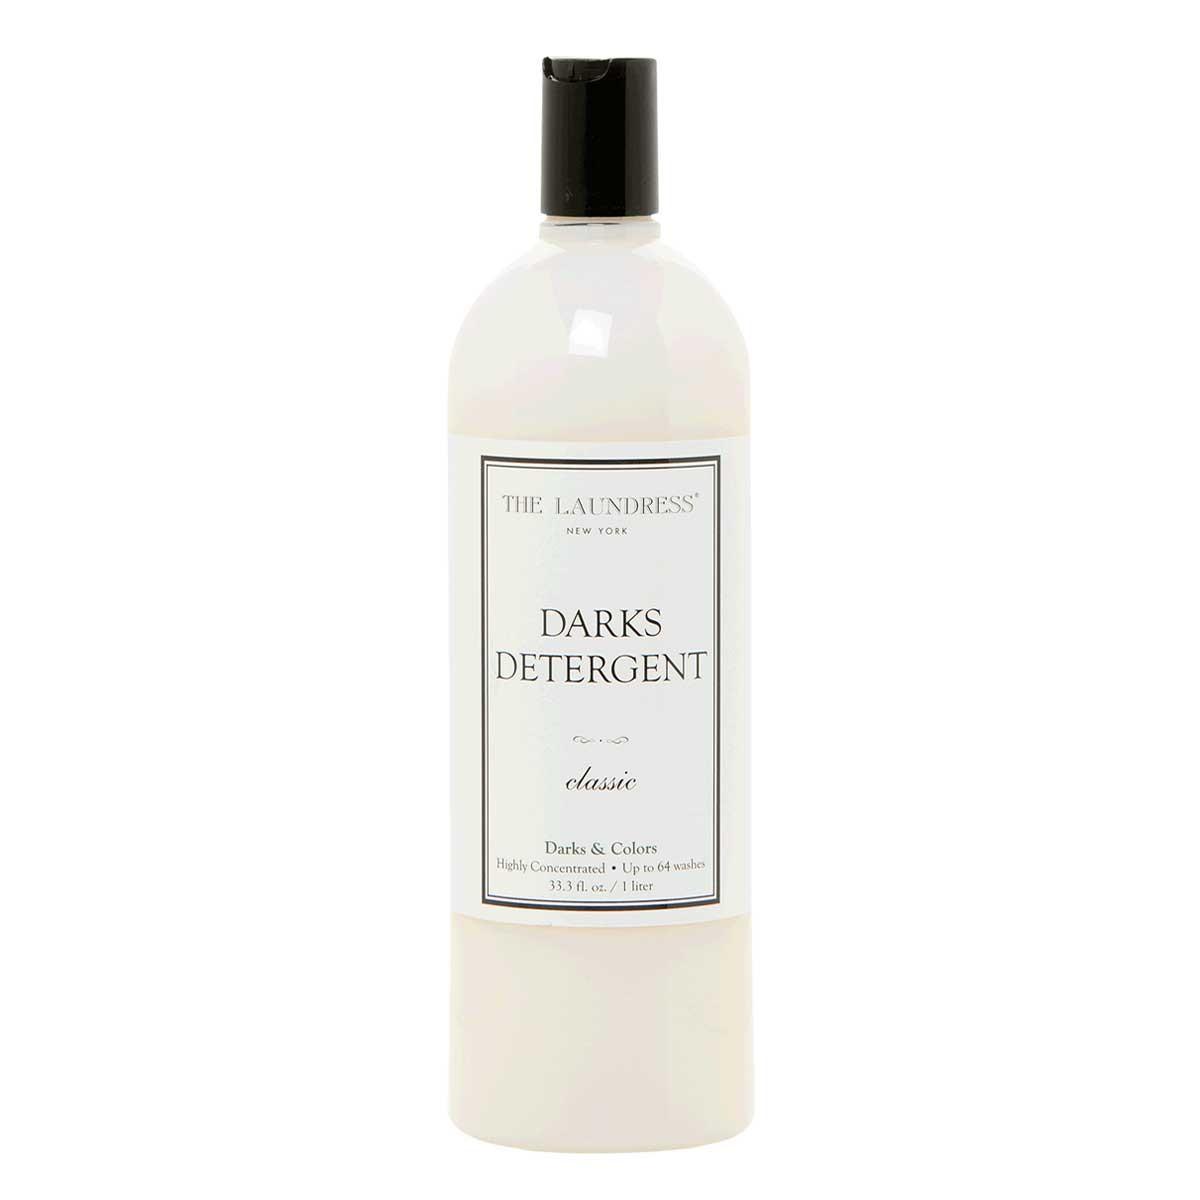 The Laundress Darks Detergent - detergente ropa oscura y de color